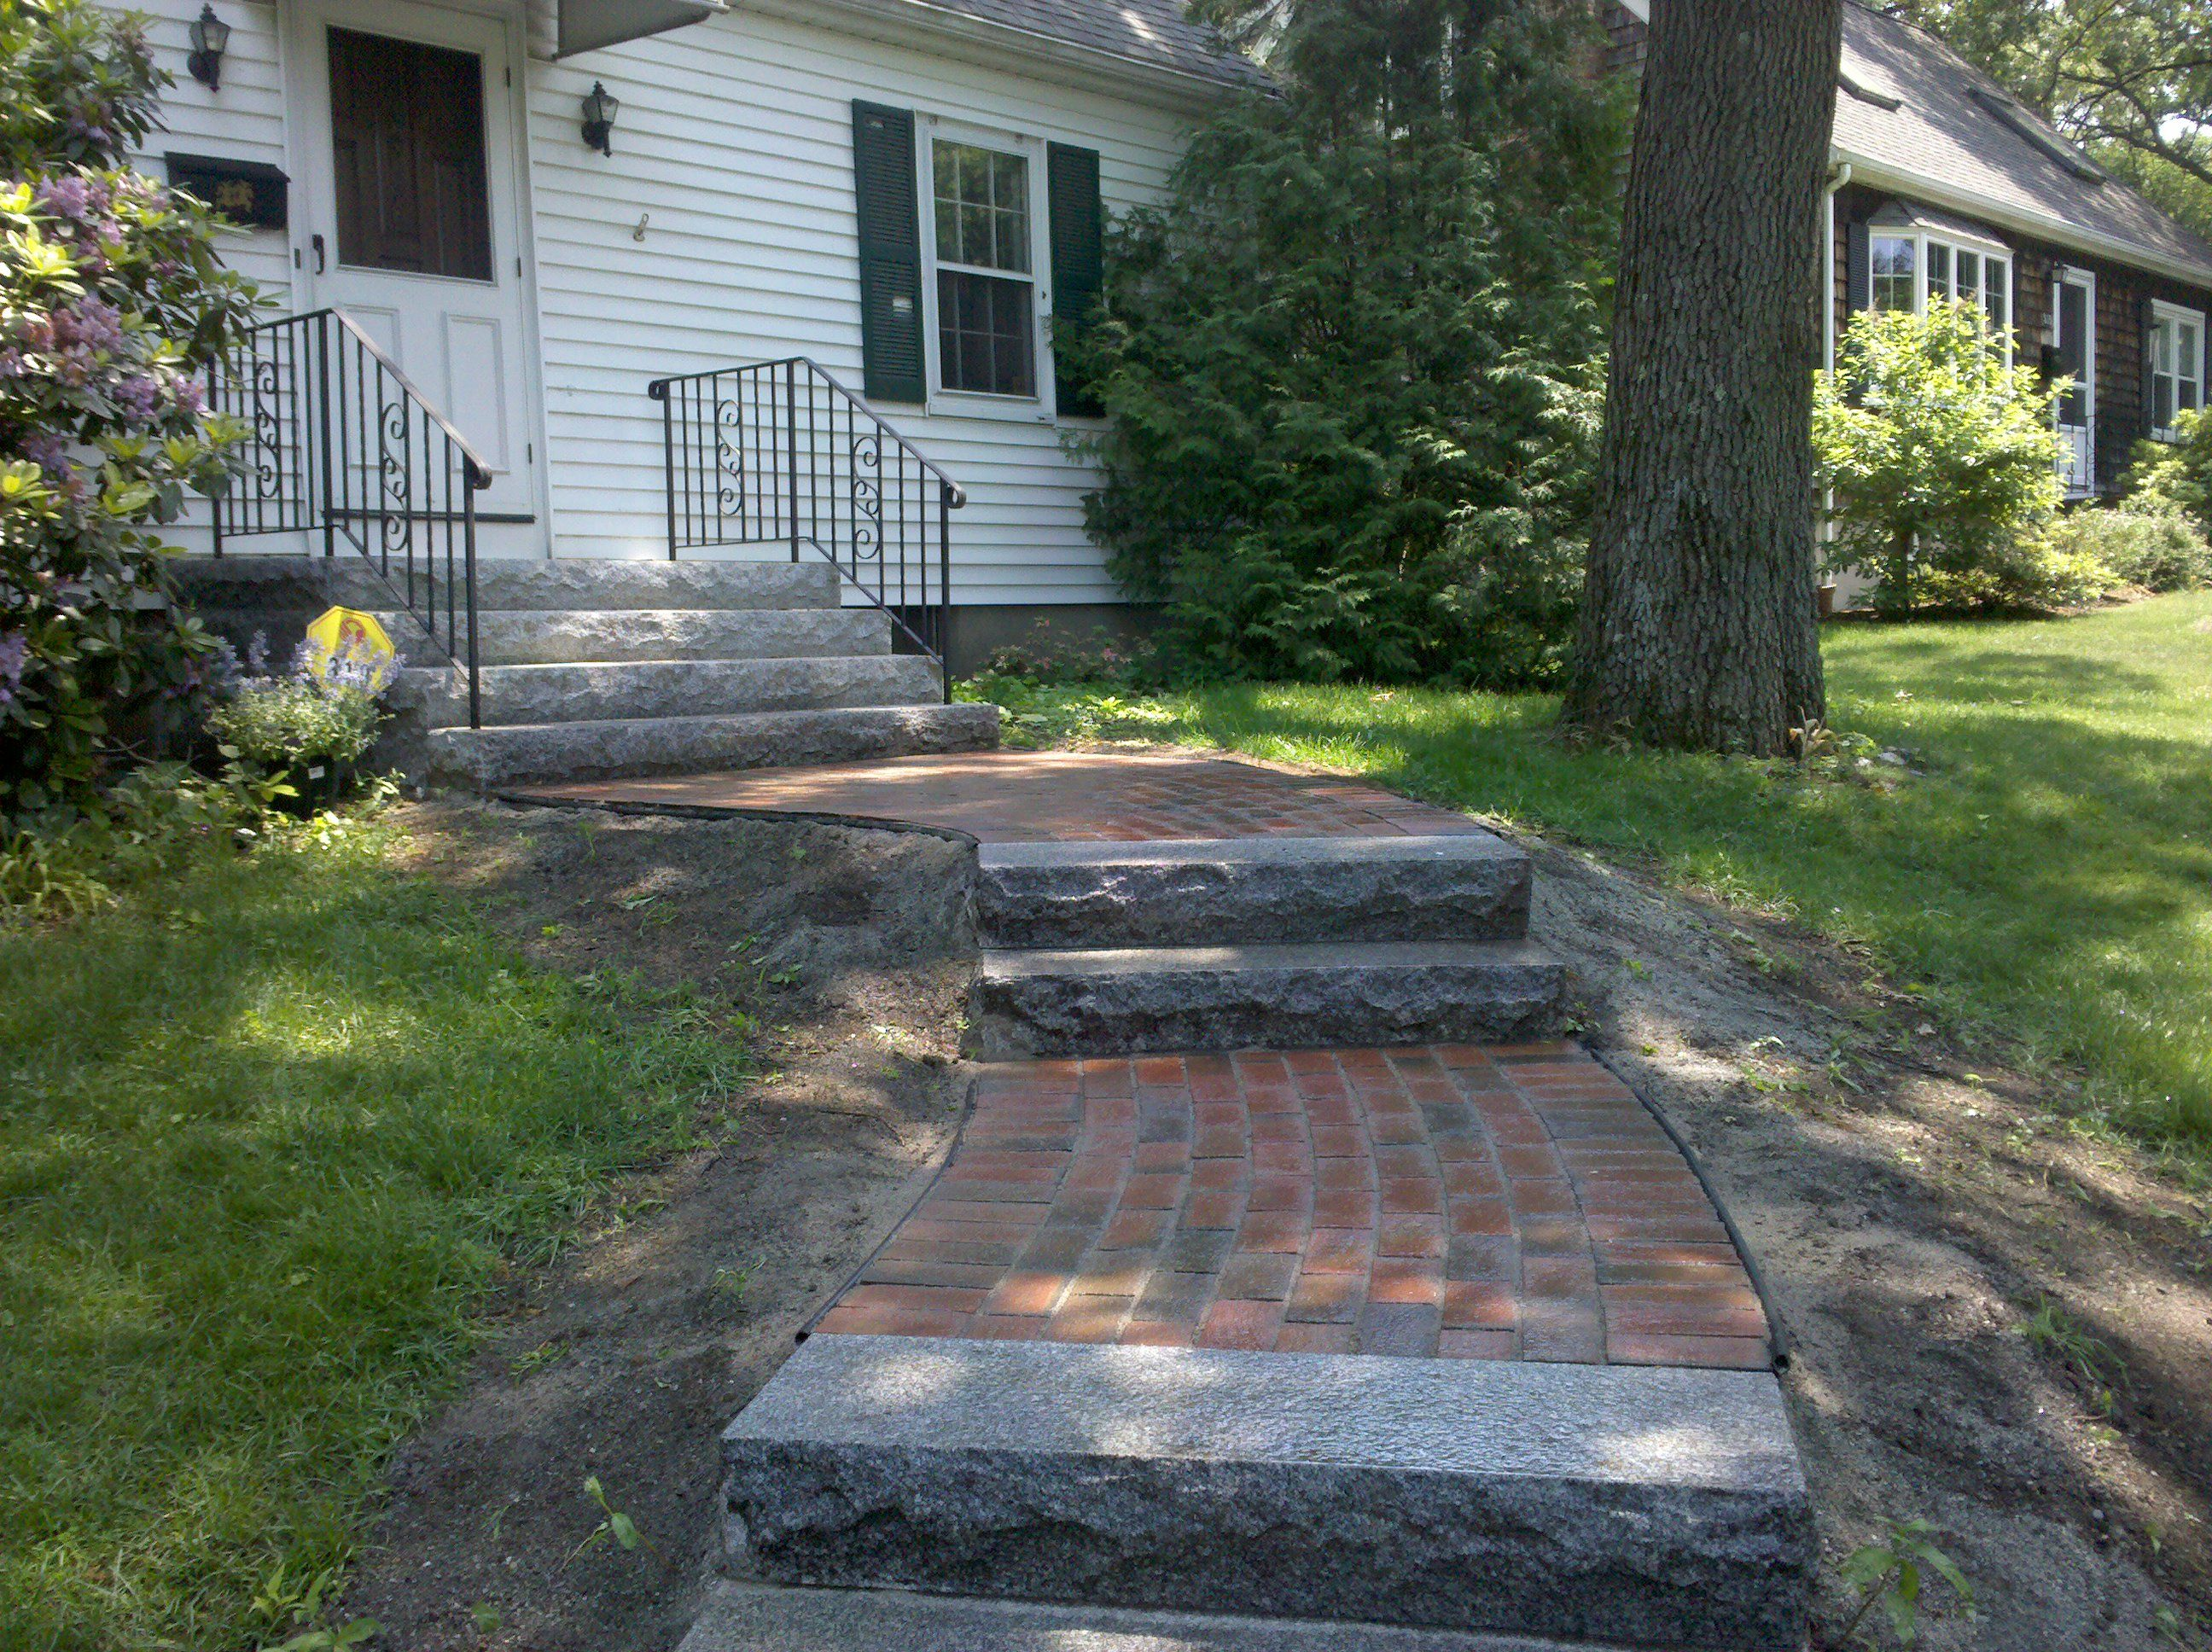 Brownstone And Brick Steps D S Brody Associates Inc Brick Steps Masonry Contractor Brick Path